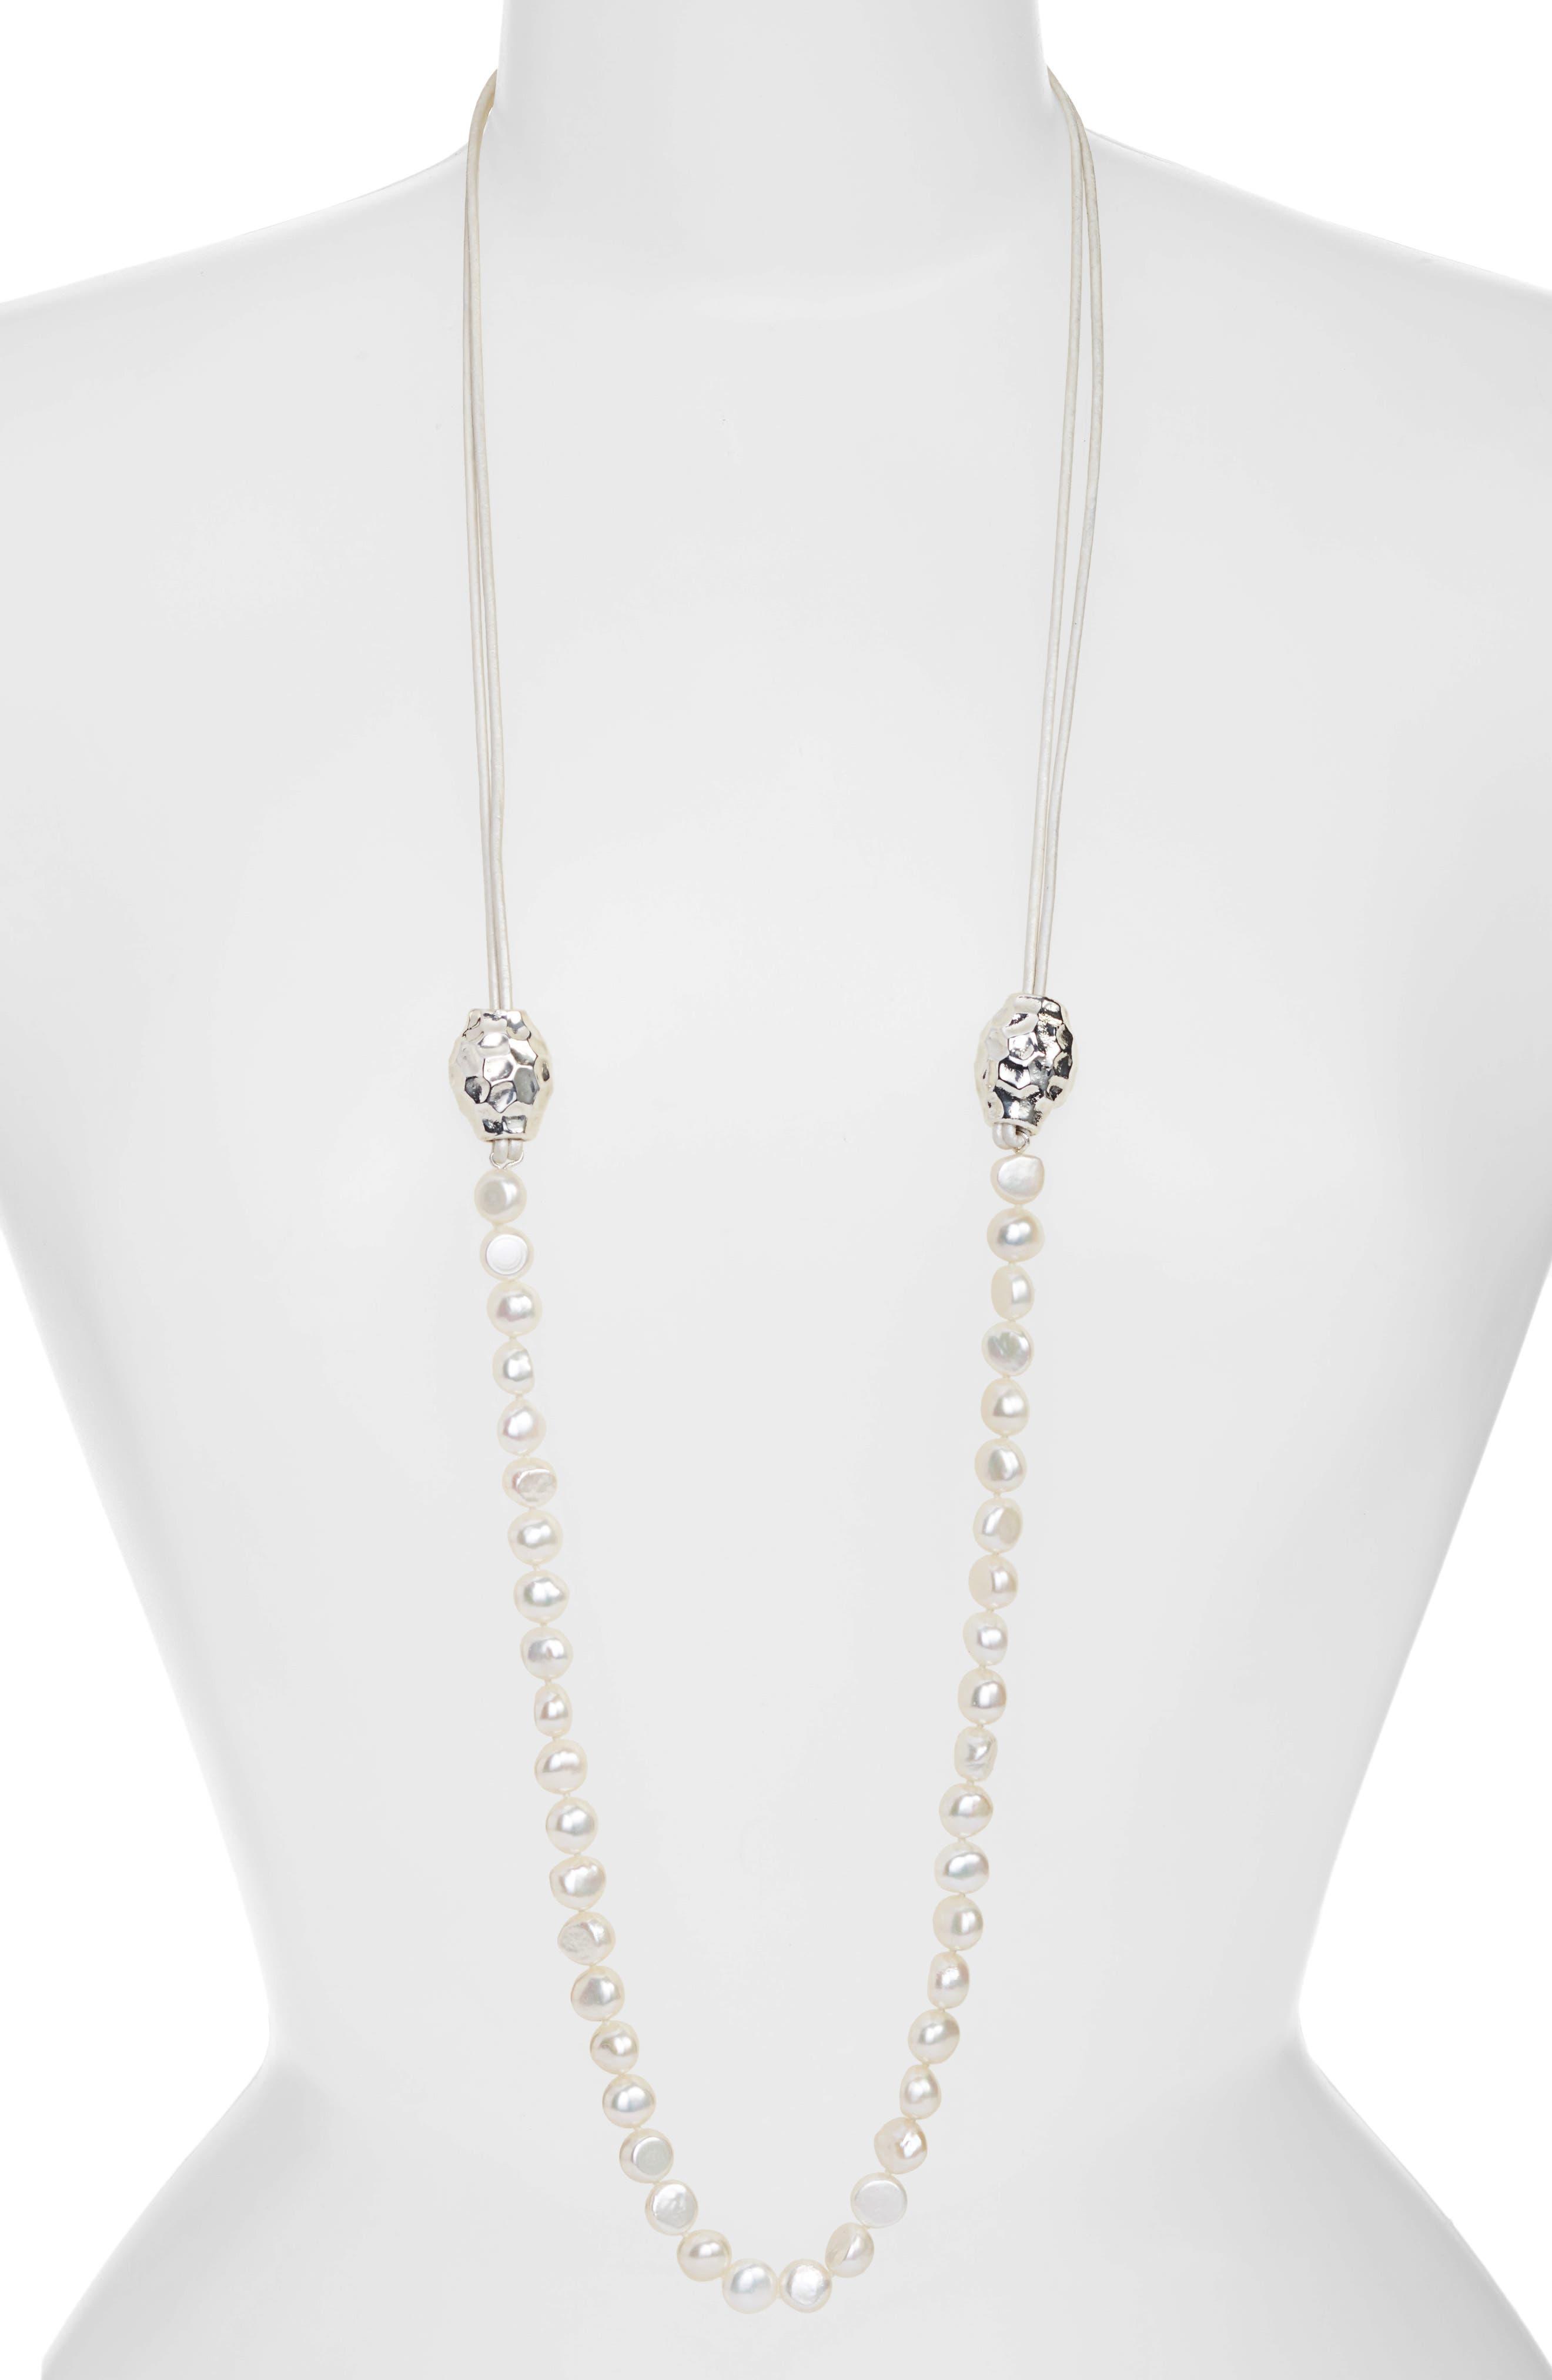 Main Image - Simon Sebbag Beaded Leather Necklace